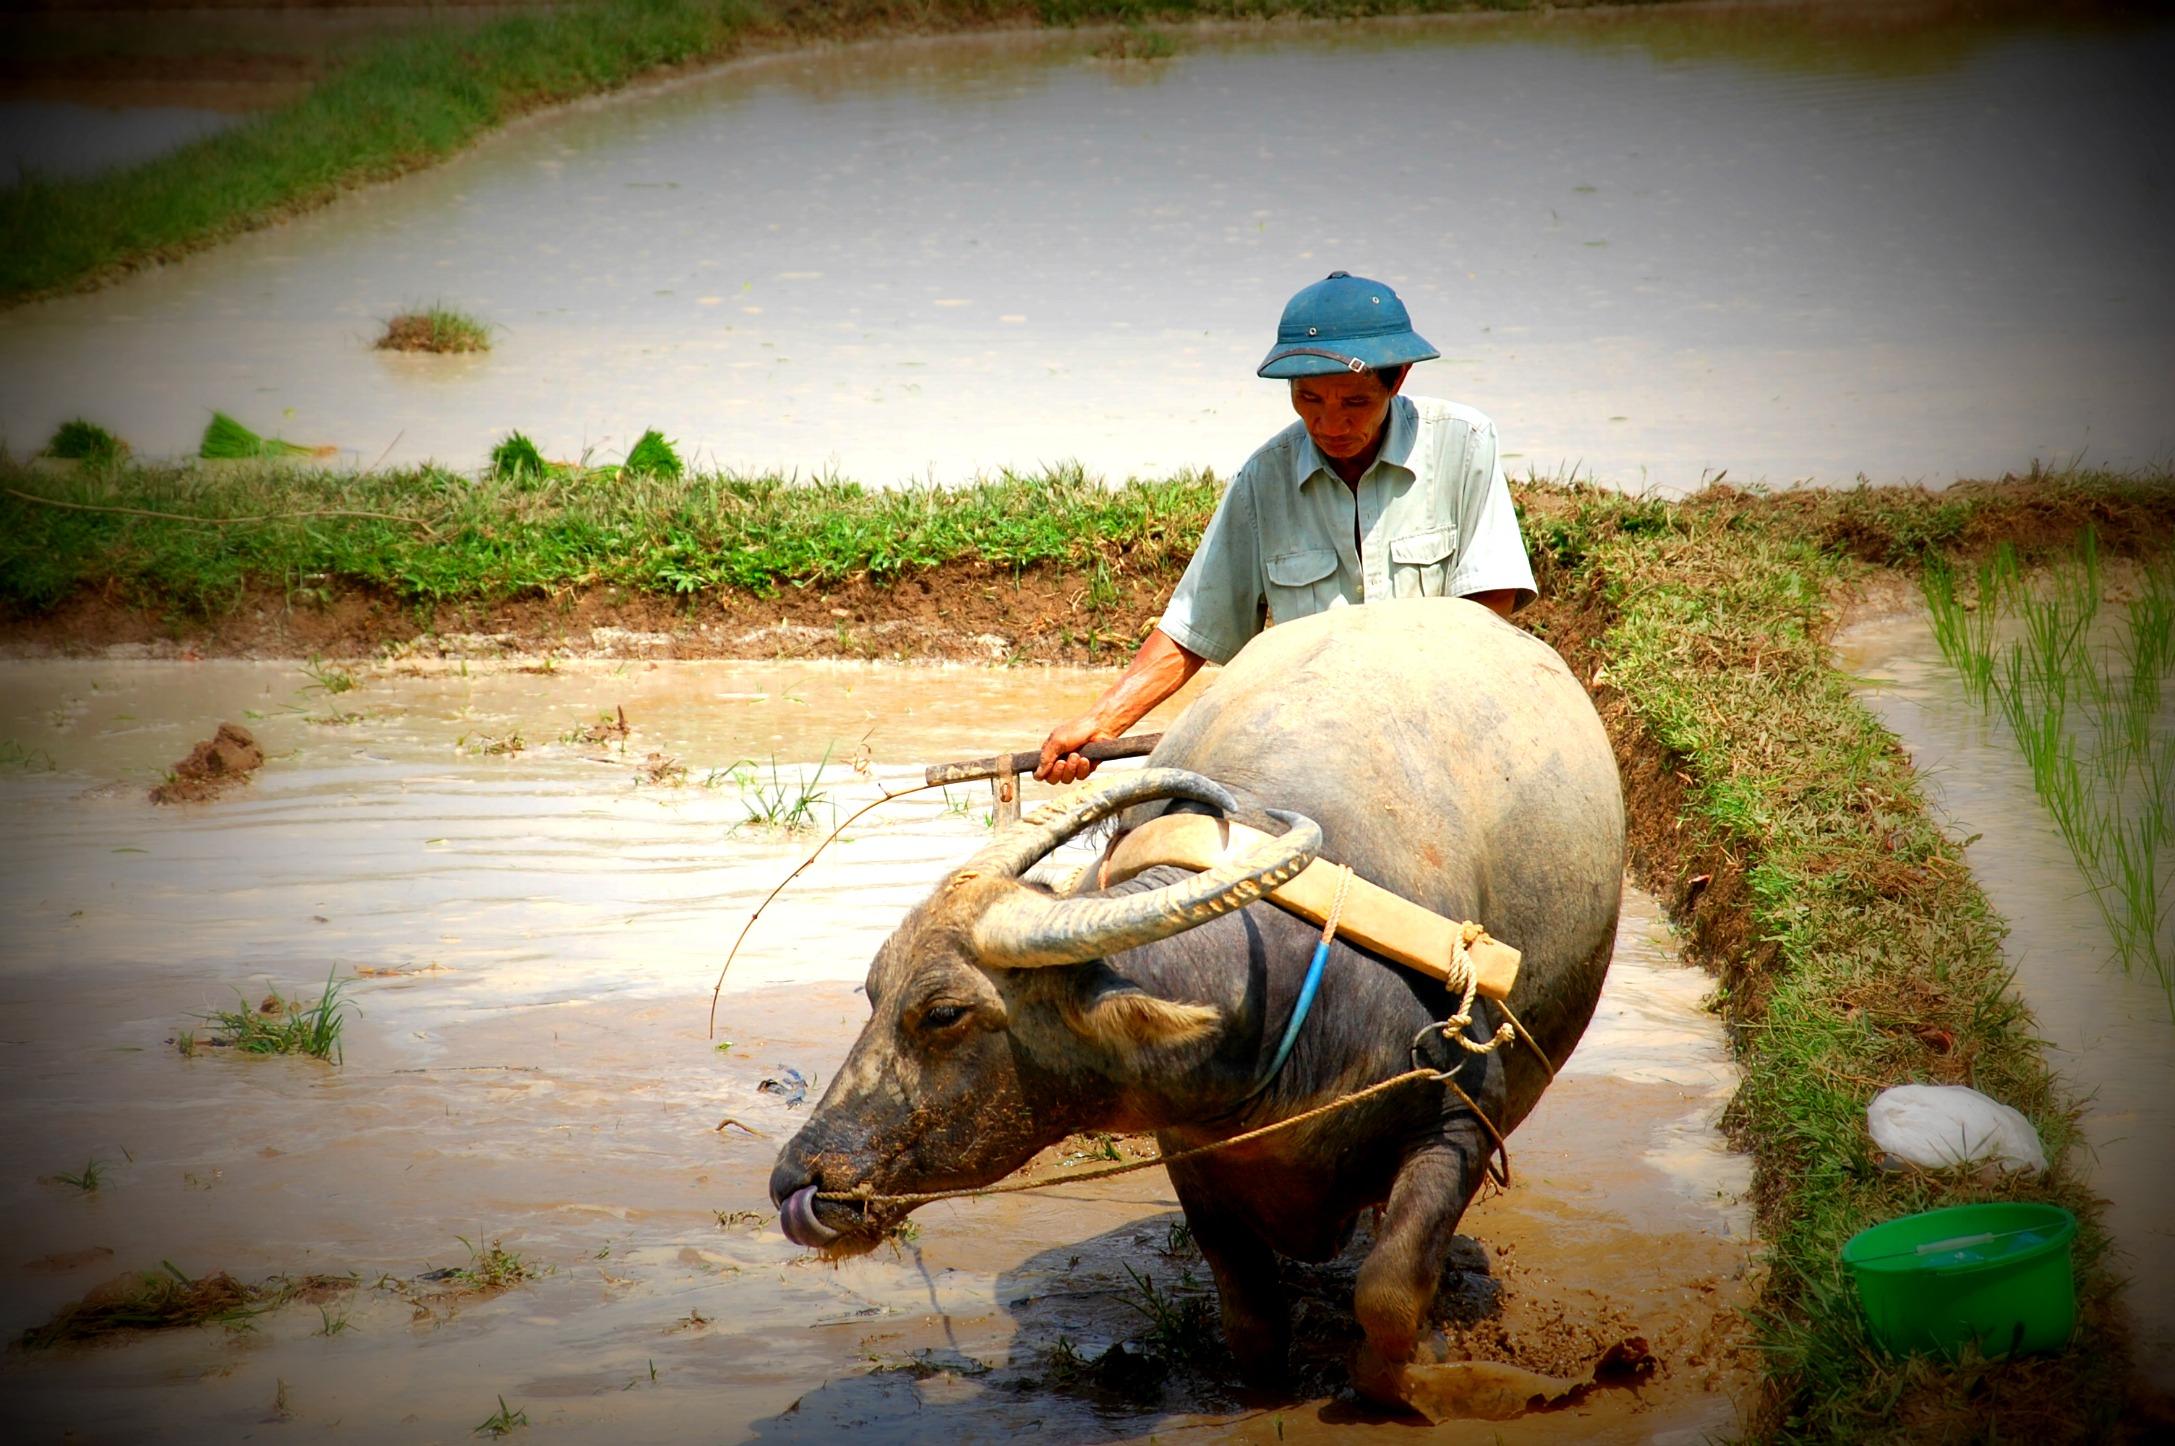 Vietnam: The Red River Delta